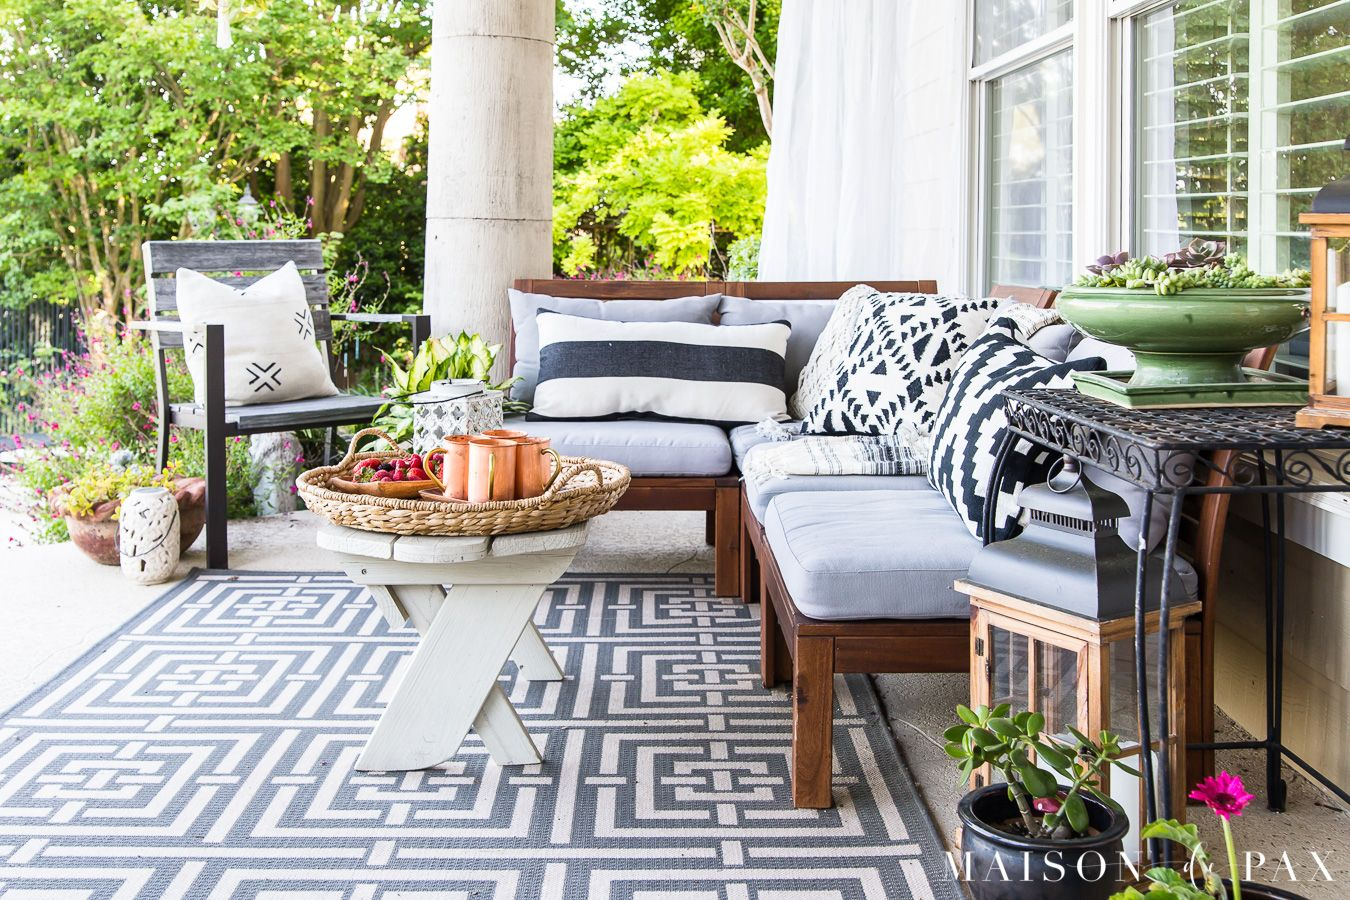 Summer Porch Decor Ideas Ferns And Succulents Maison De Pax Summer Outdoor Decor Summer Porch Decor Summer Patio Decor